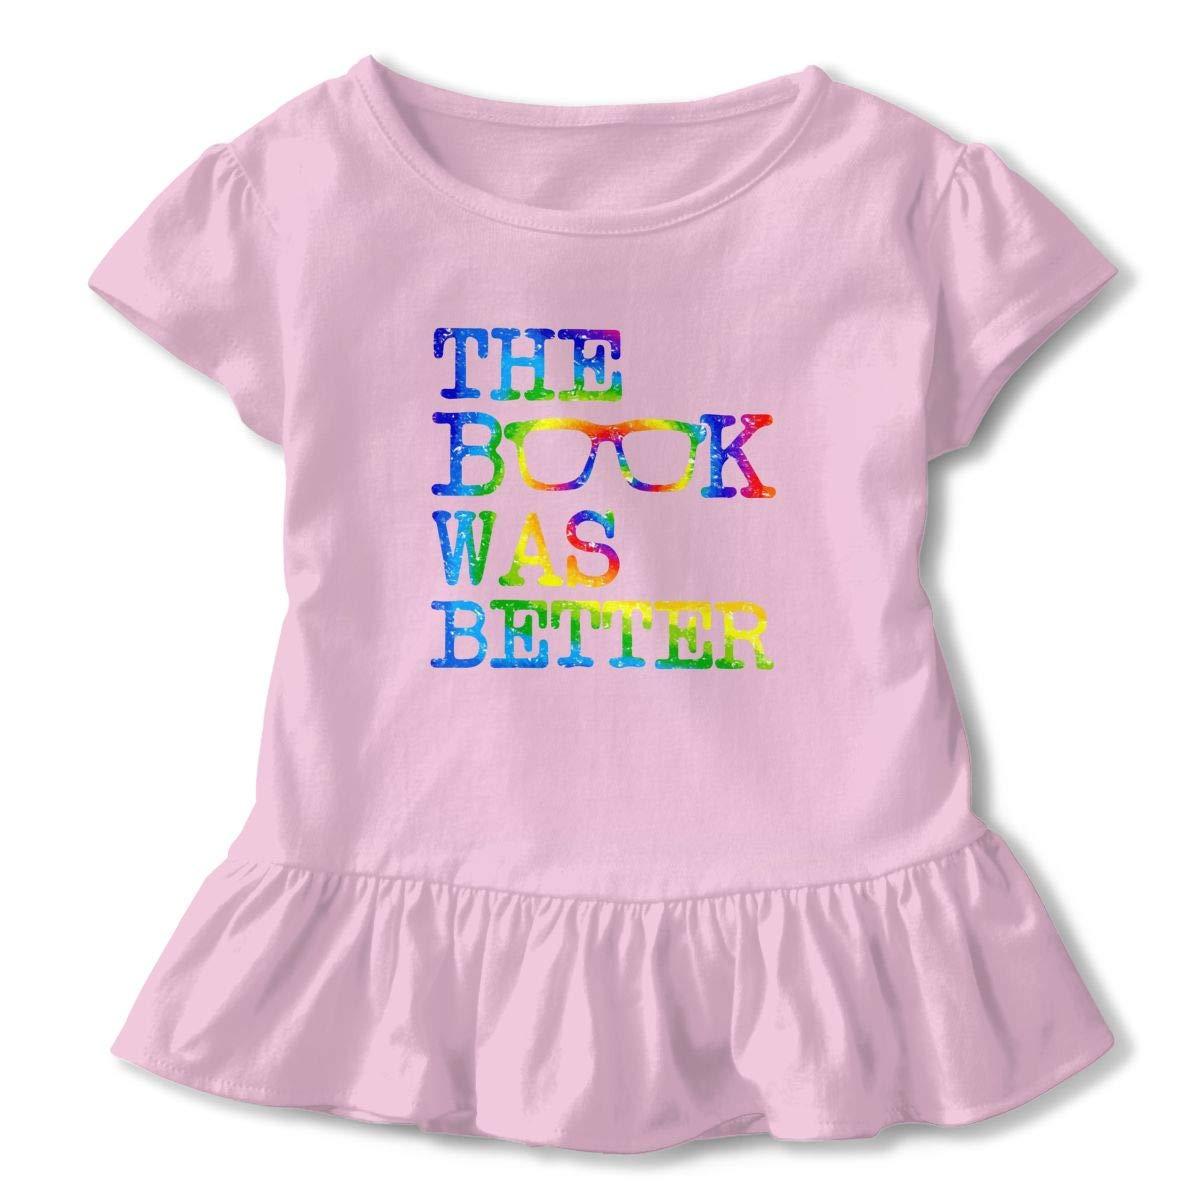 Clarissa Bertha The Book was Better Funny Toddler Baby Girls Short Sleeve Ruffle T-Shirt